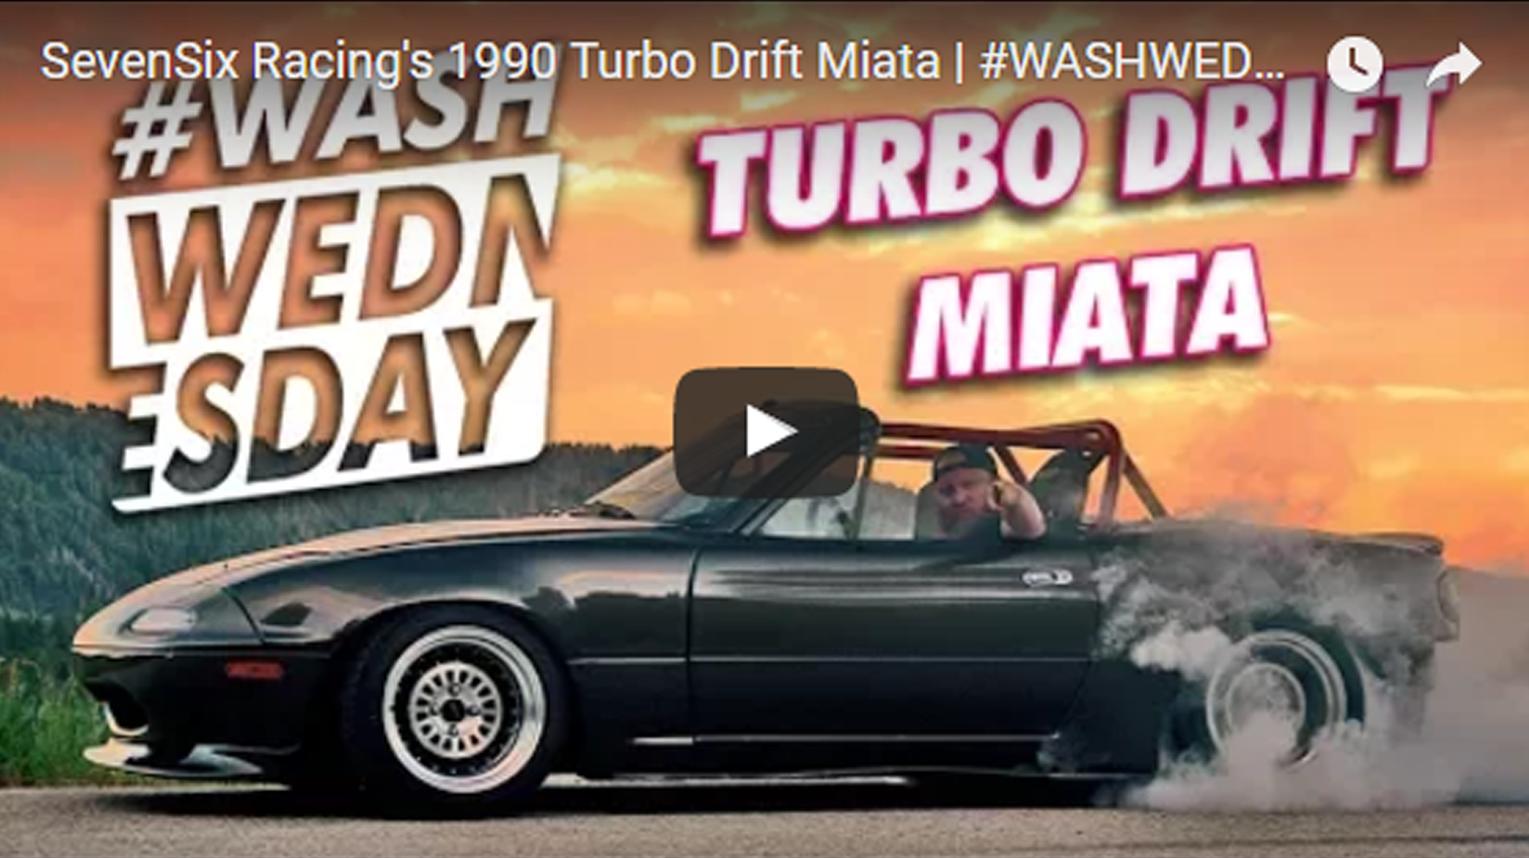 SevenSix Racing's 1990 Turbo Drift Miata | #WASHWEDNESDAY